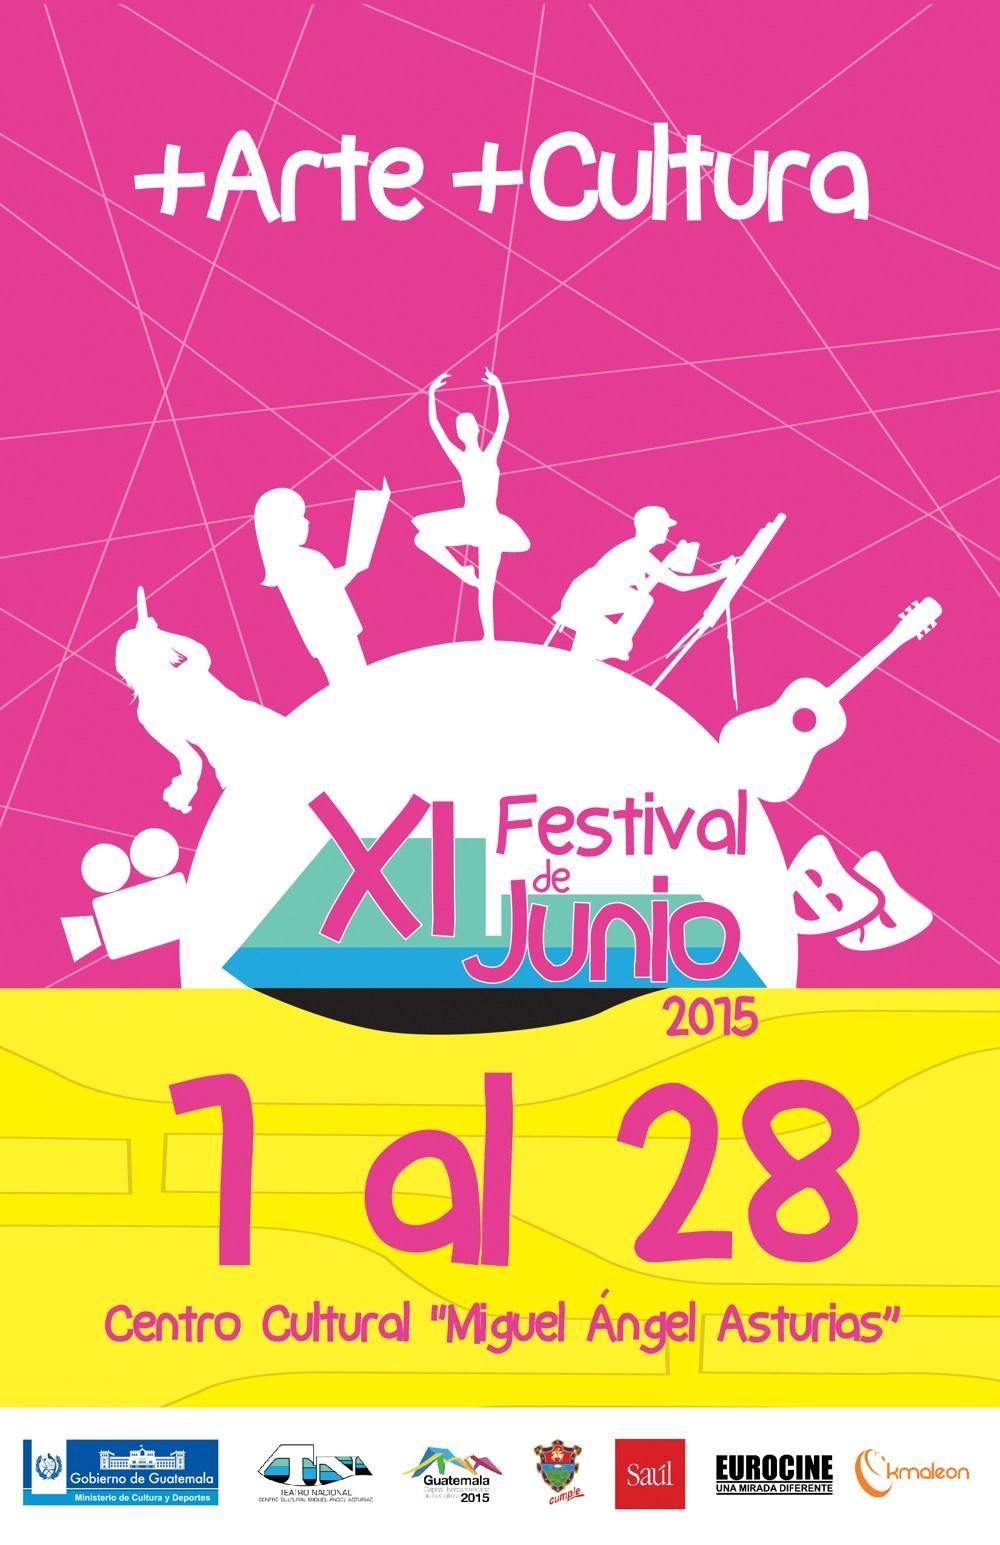 XI Festival de Junio 2015